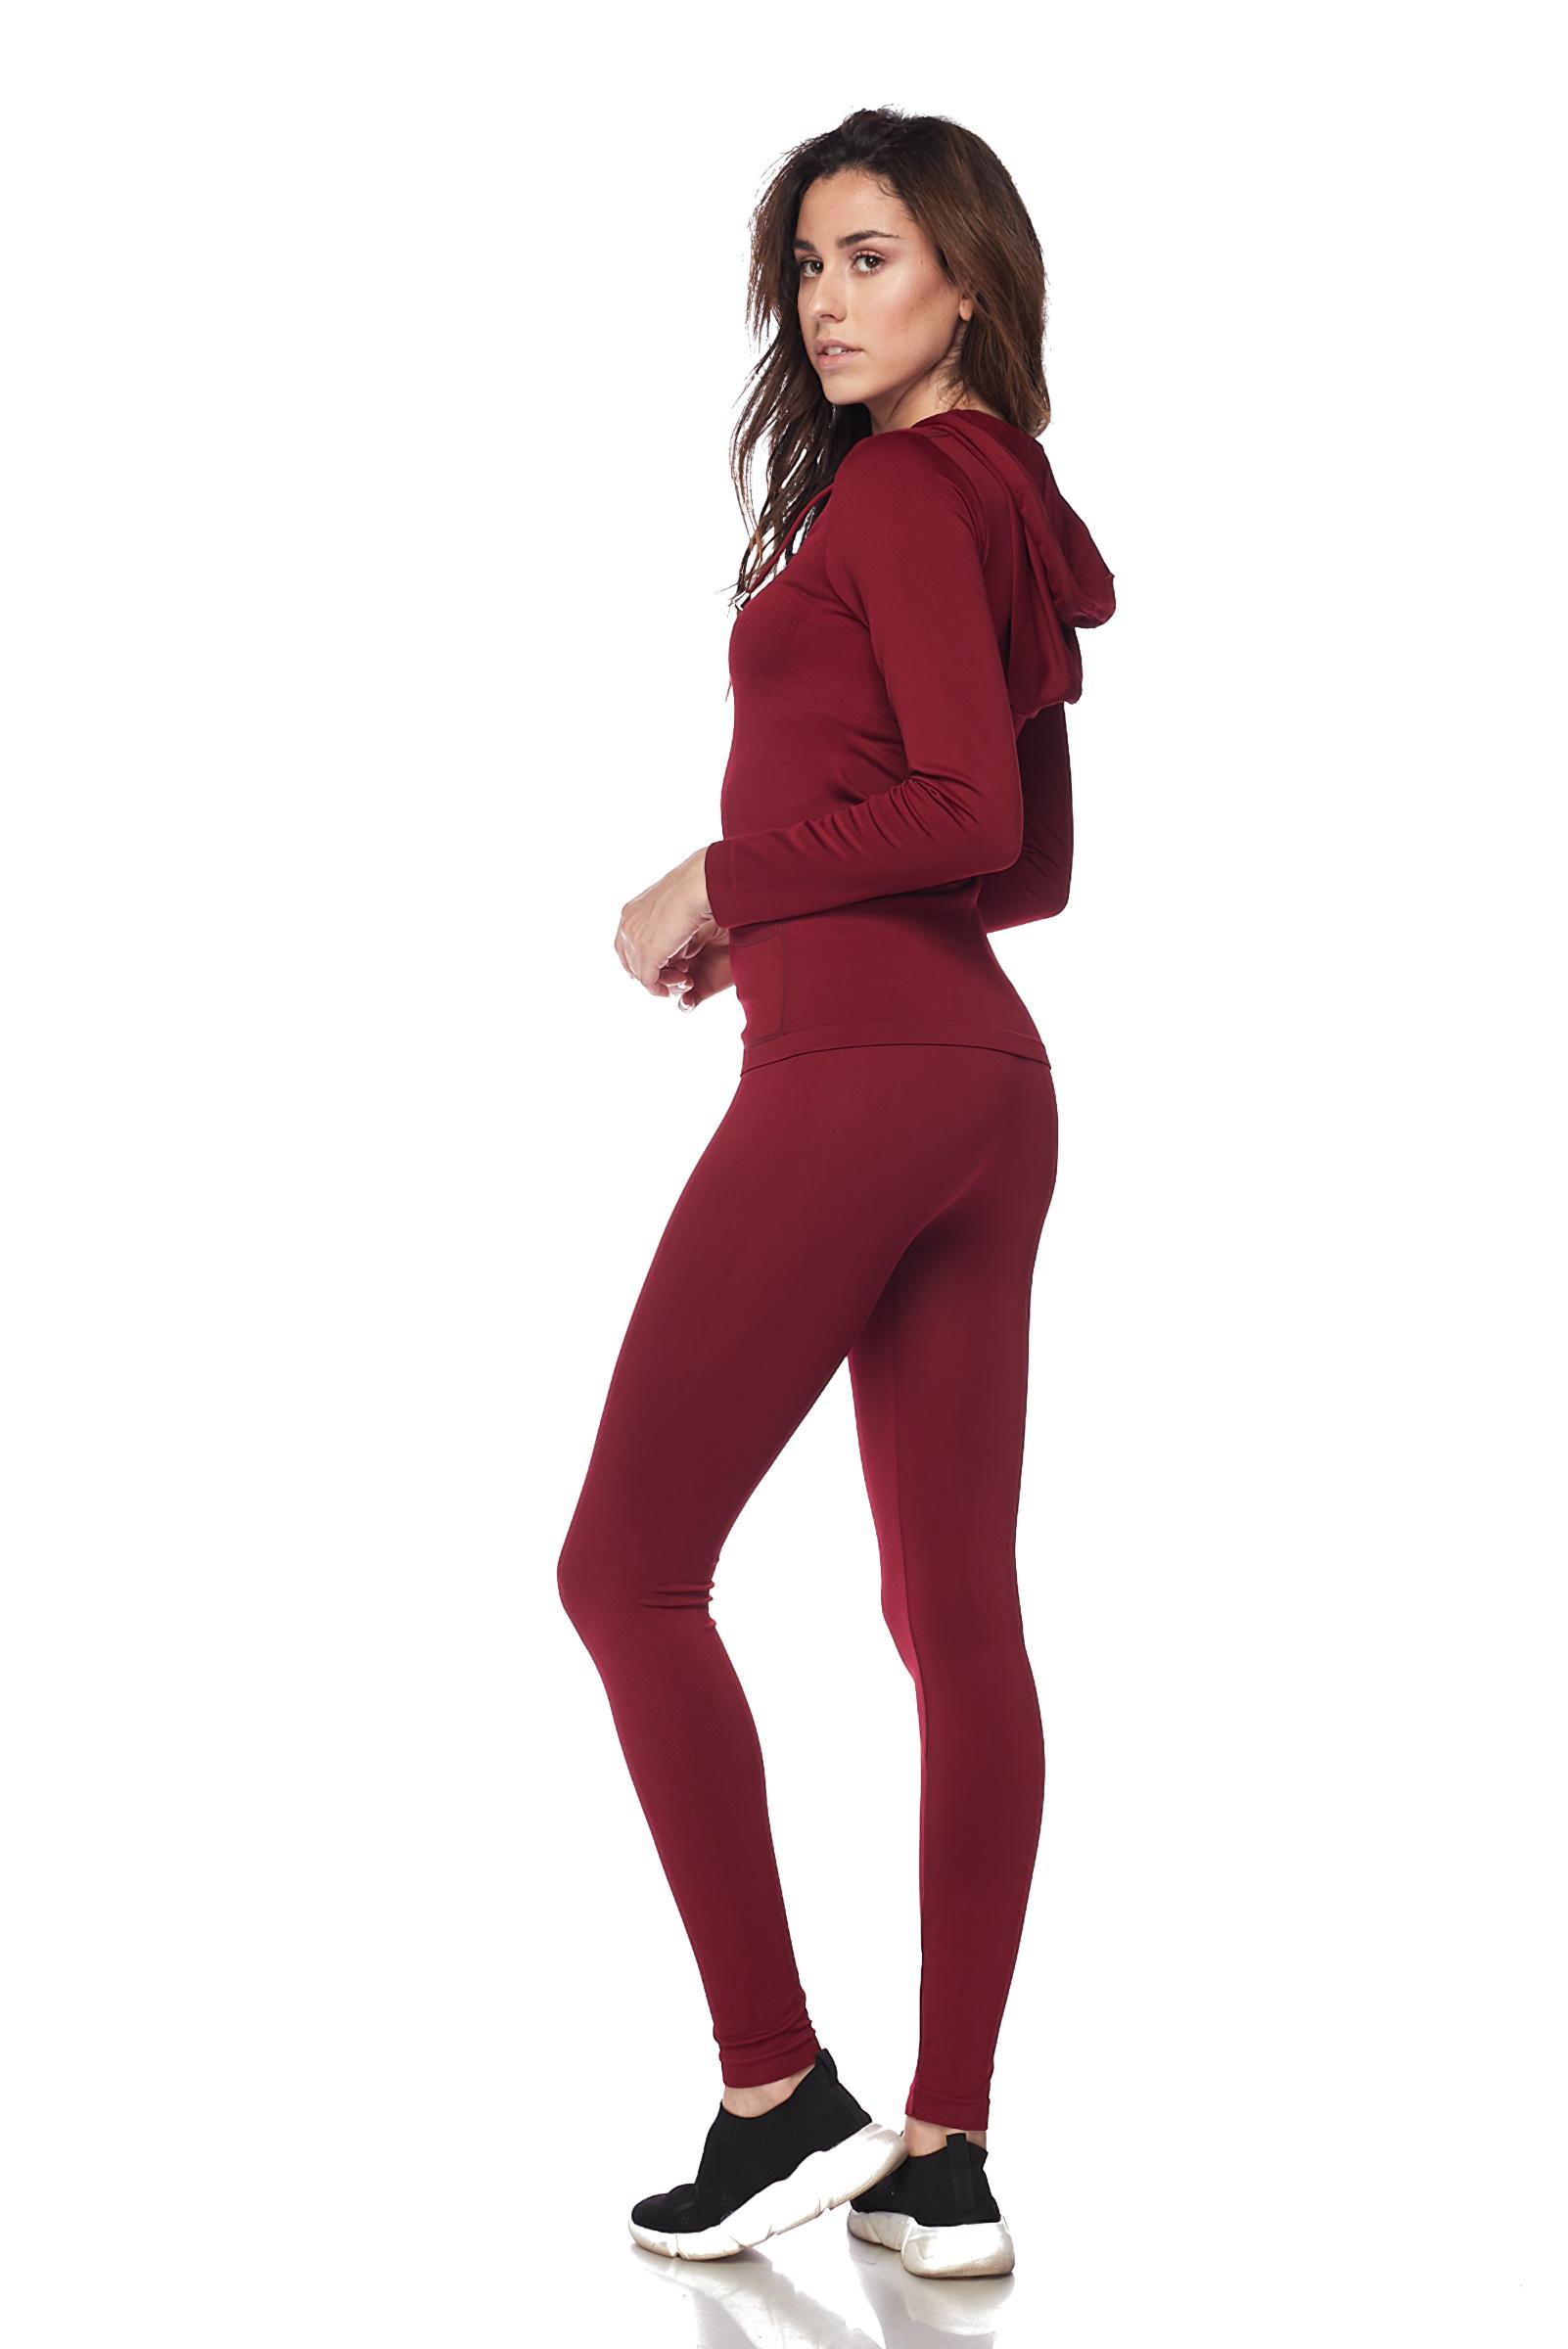 Women-039-s-Juniors-Active-Set-Wear-Zip-Up-Hoodie-and-Legging thumbnail 19